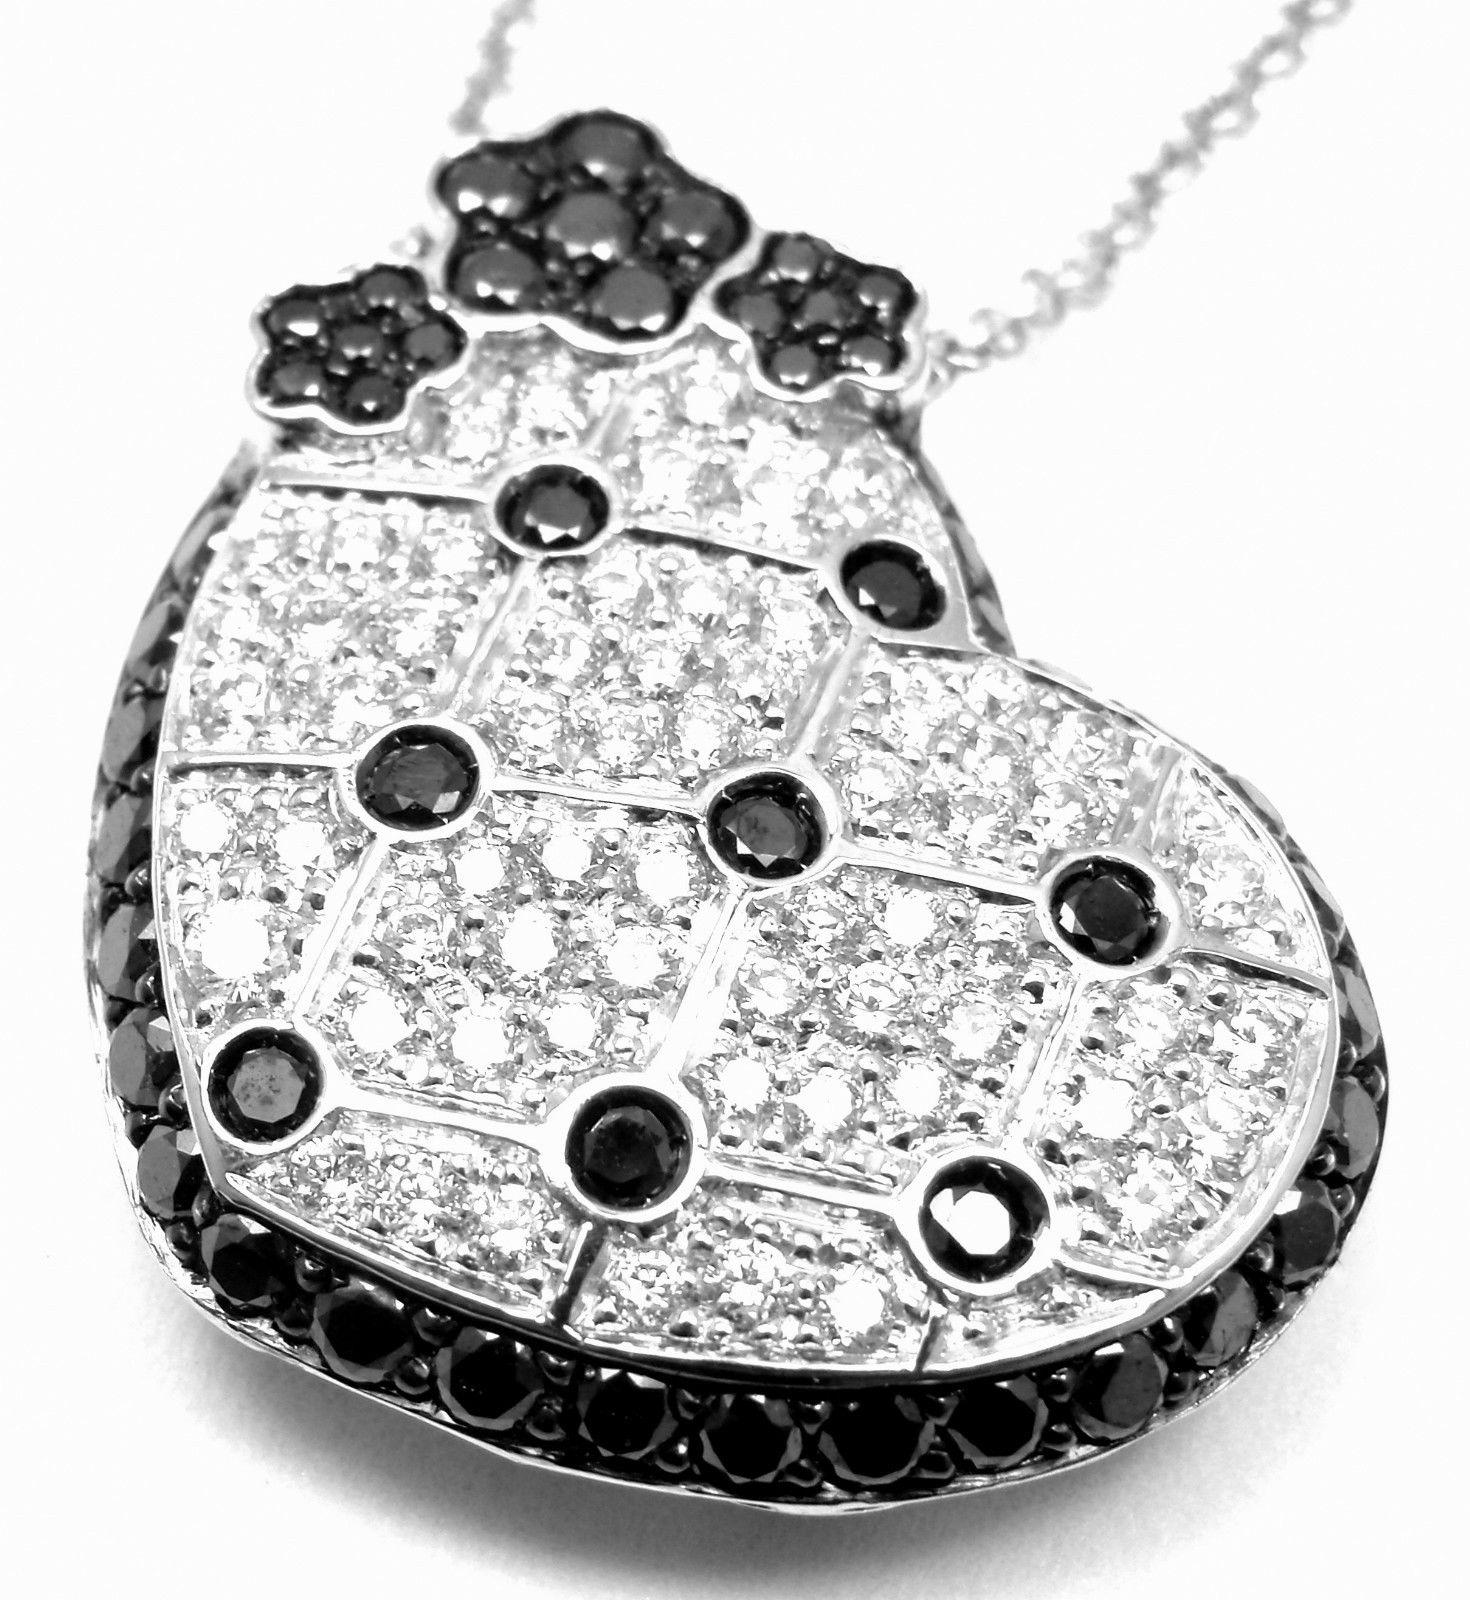 """""Pasquale Bruni 18K White Gold Diamond Pendant Necklace"""""" 563990"